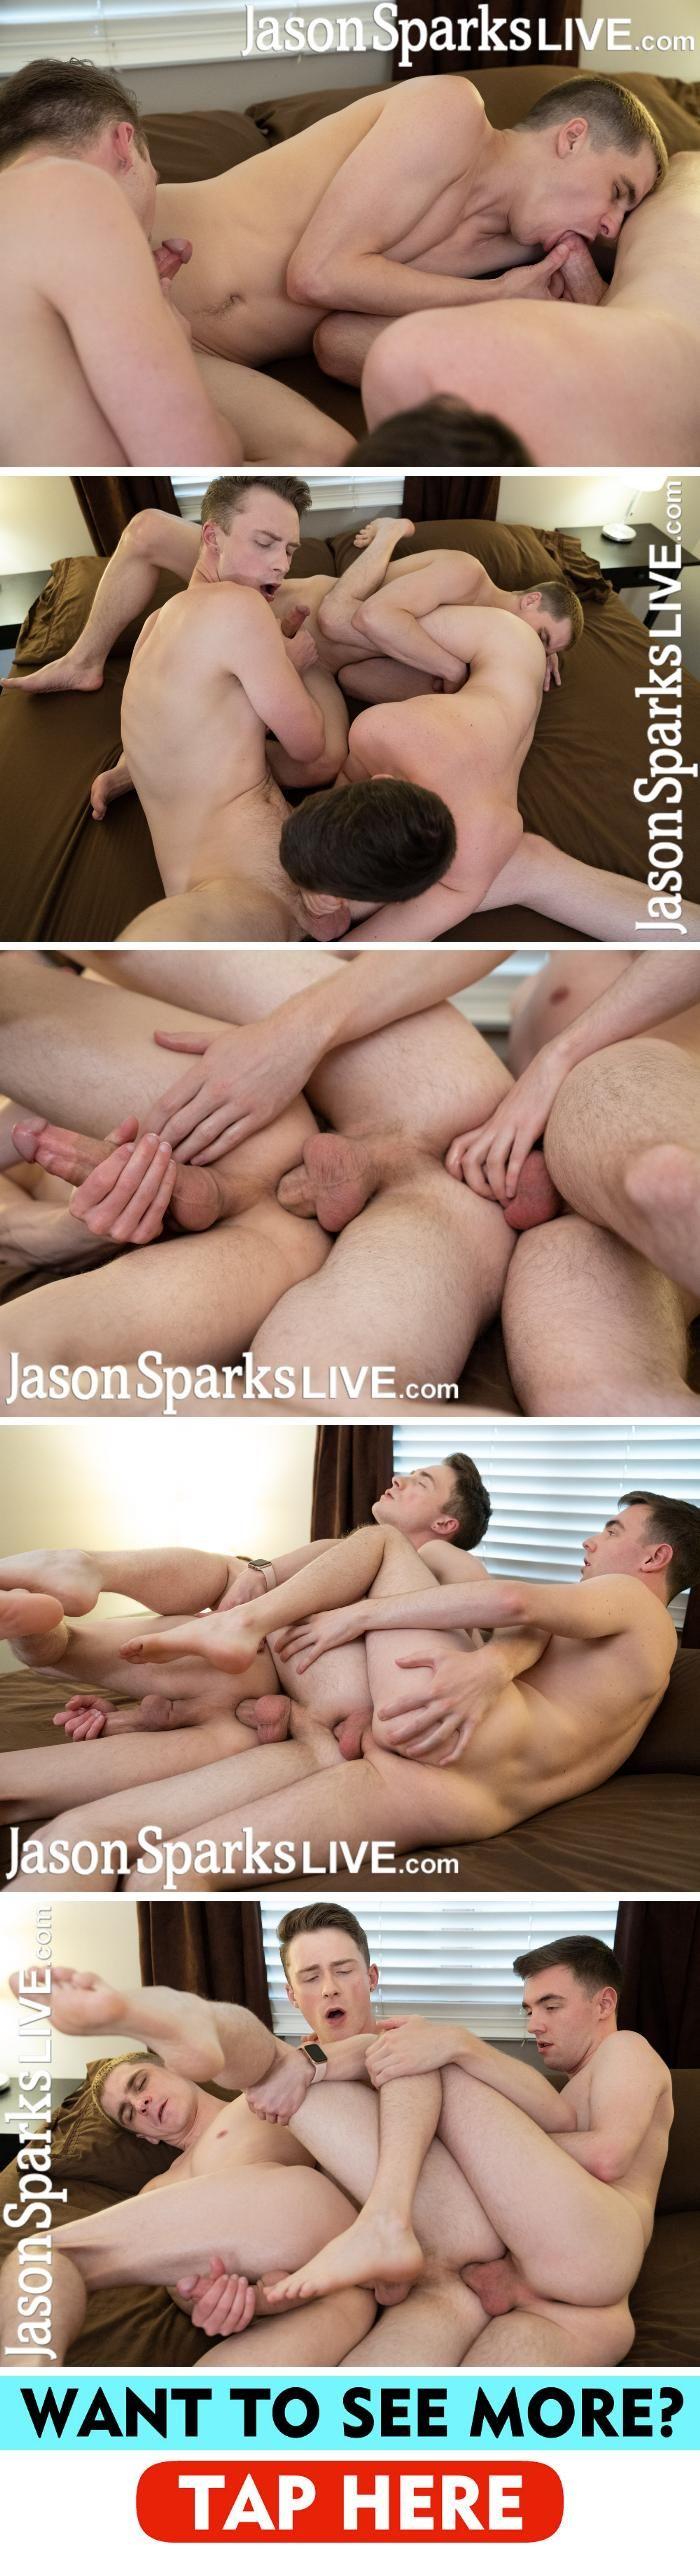 Jason Sparks Live: Cole Blue, Marcus Ryan & Lucas Ryder 1